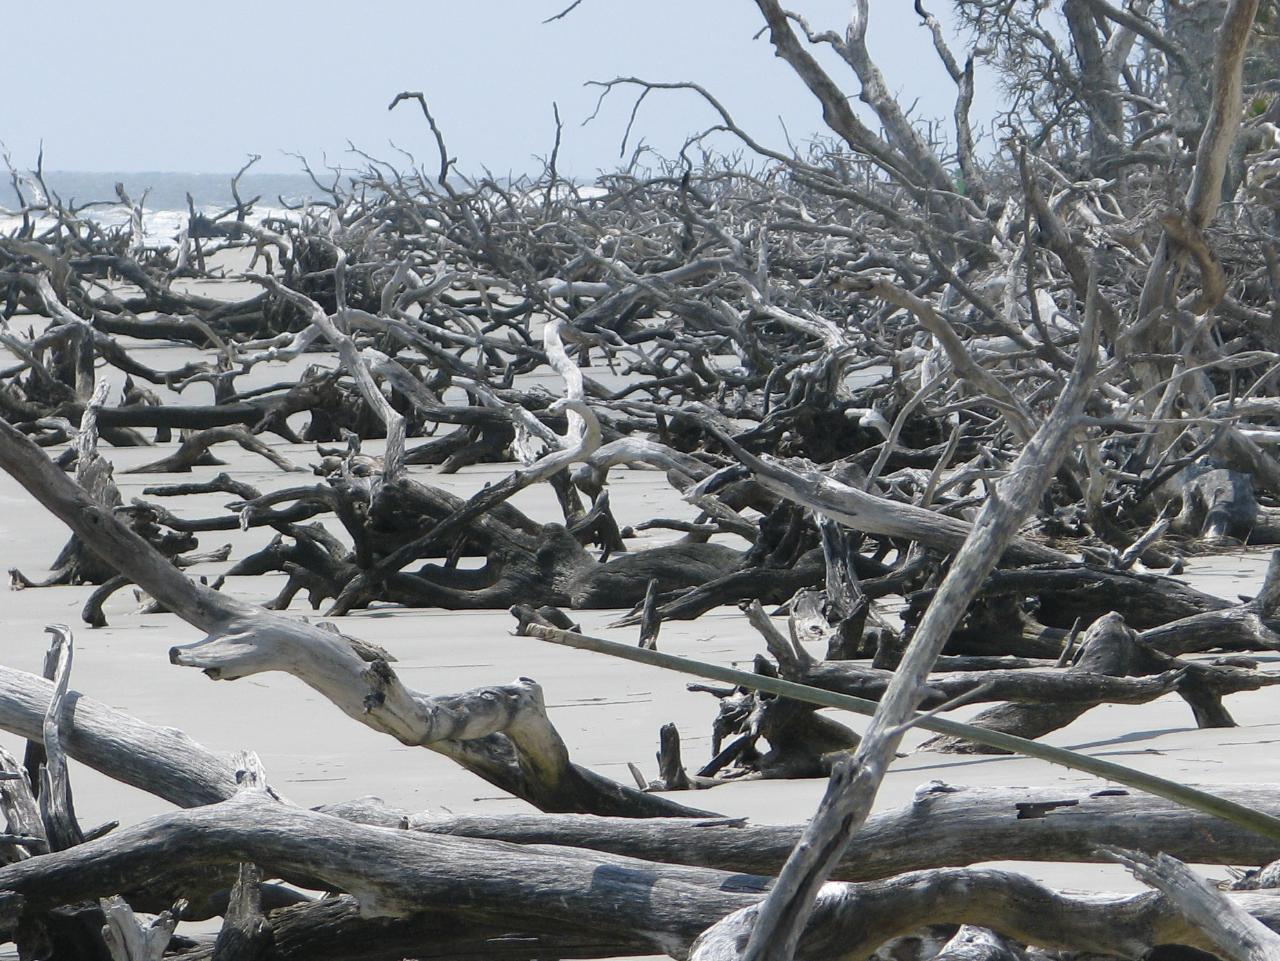 Georgia Conservancy Blackbeard Island Paddle Jan. 28th - Kayak Rental